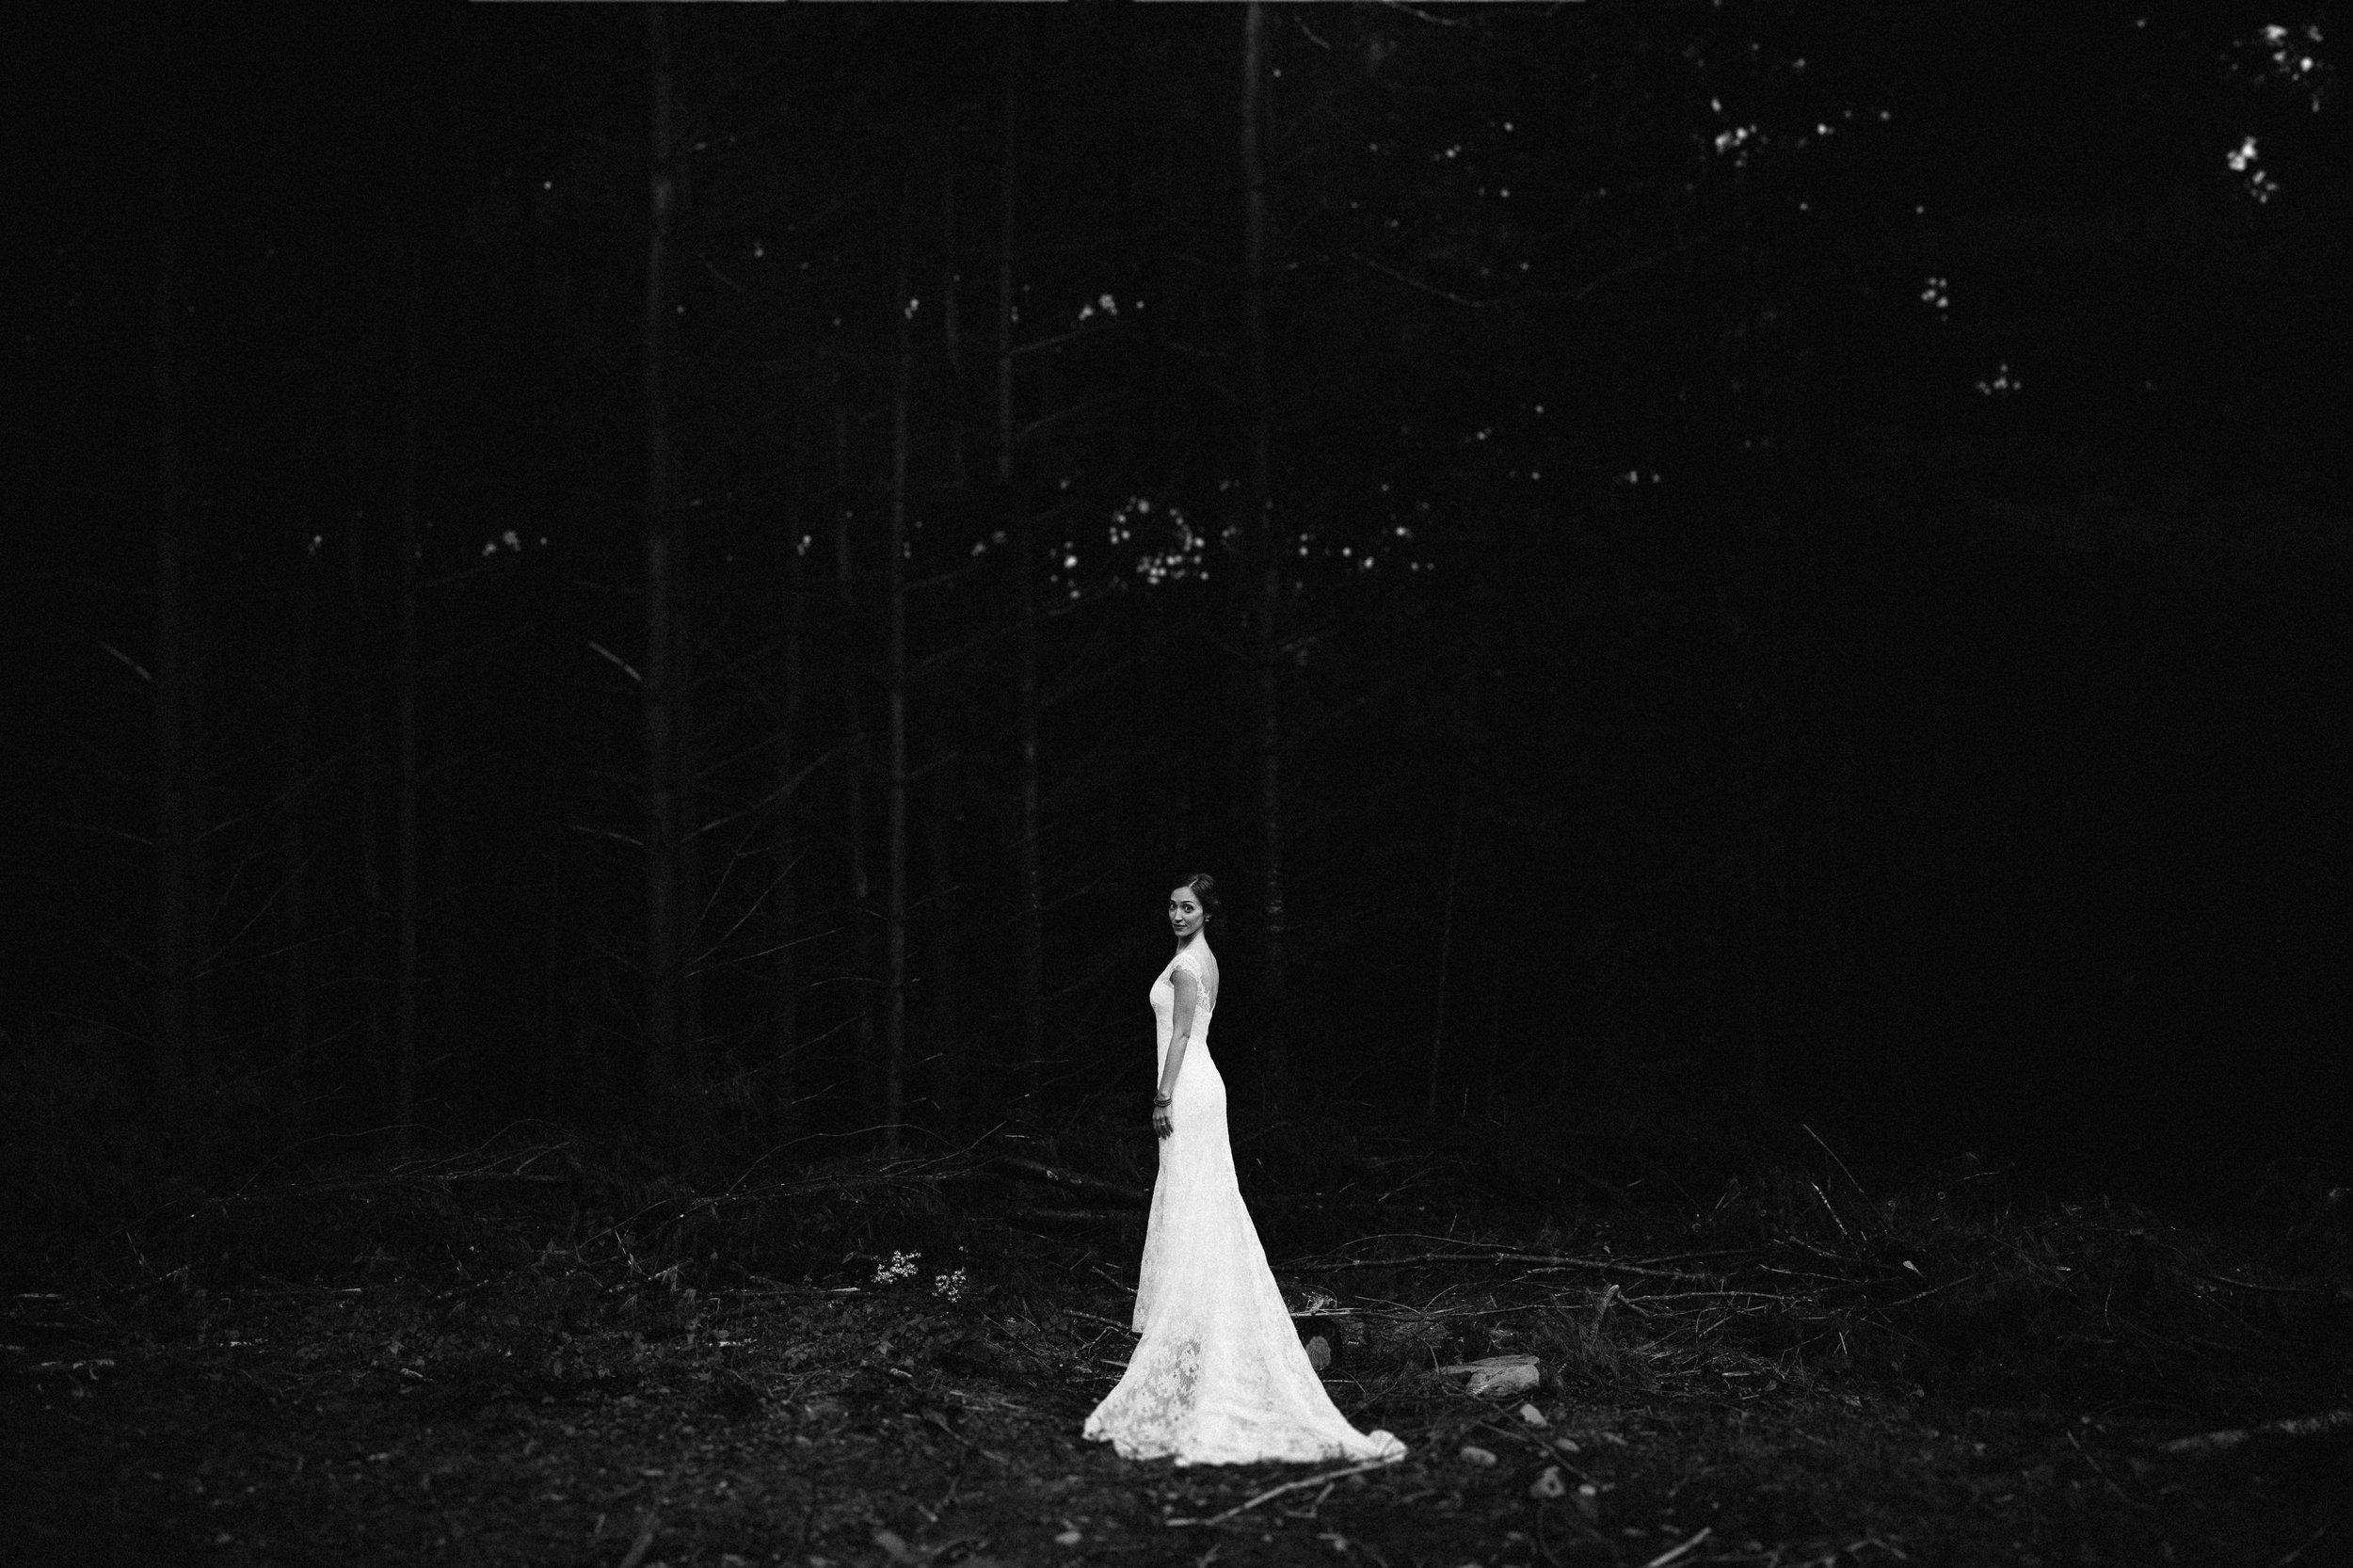 Wedding_Mount_Tremper_Arts_Catskills_Isabel_Robbie_JeanLaurentGaudy_580.jpg